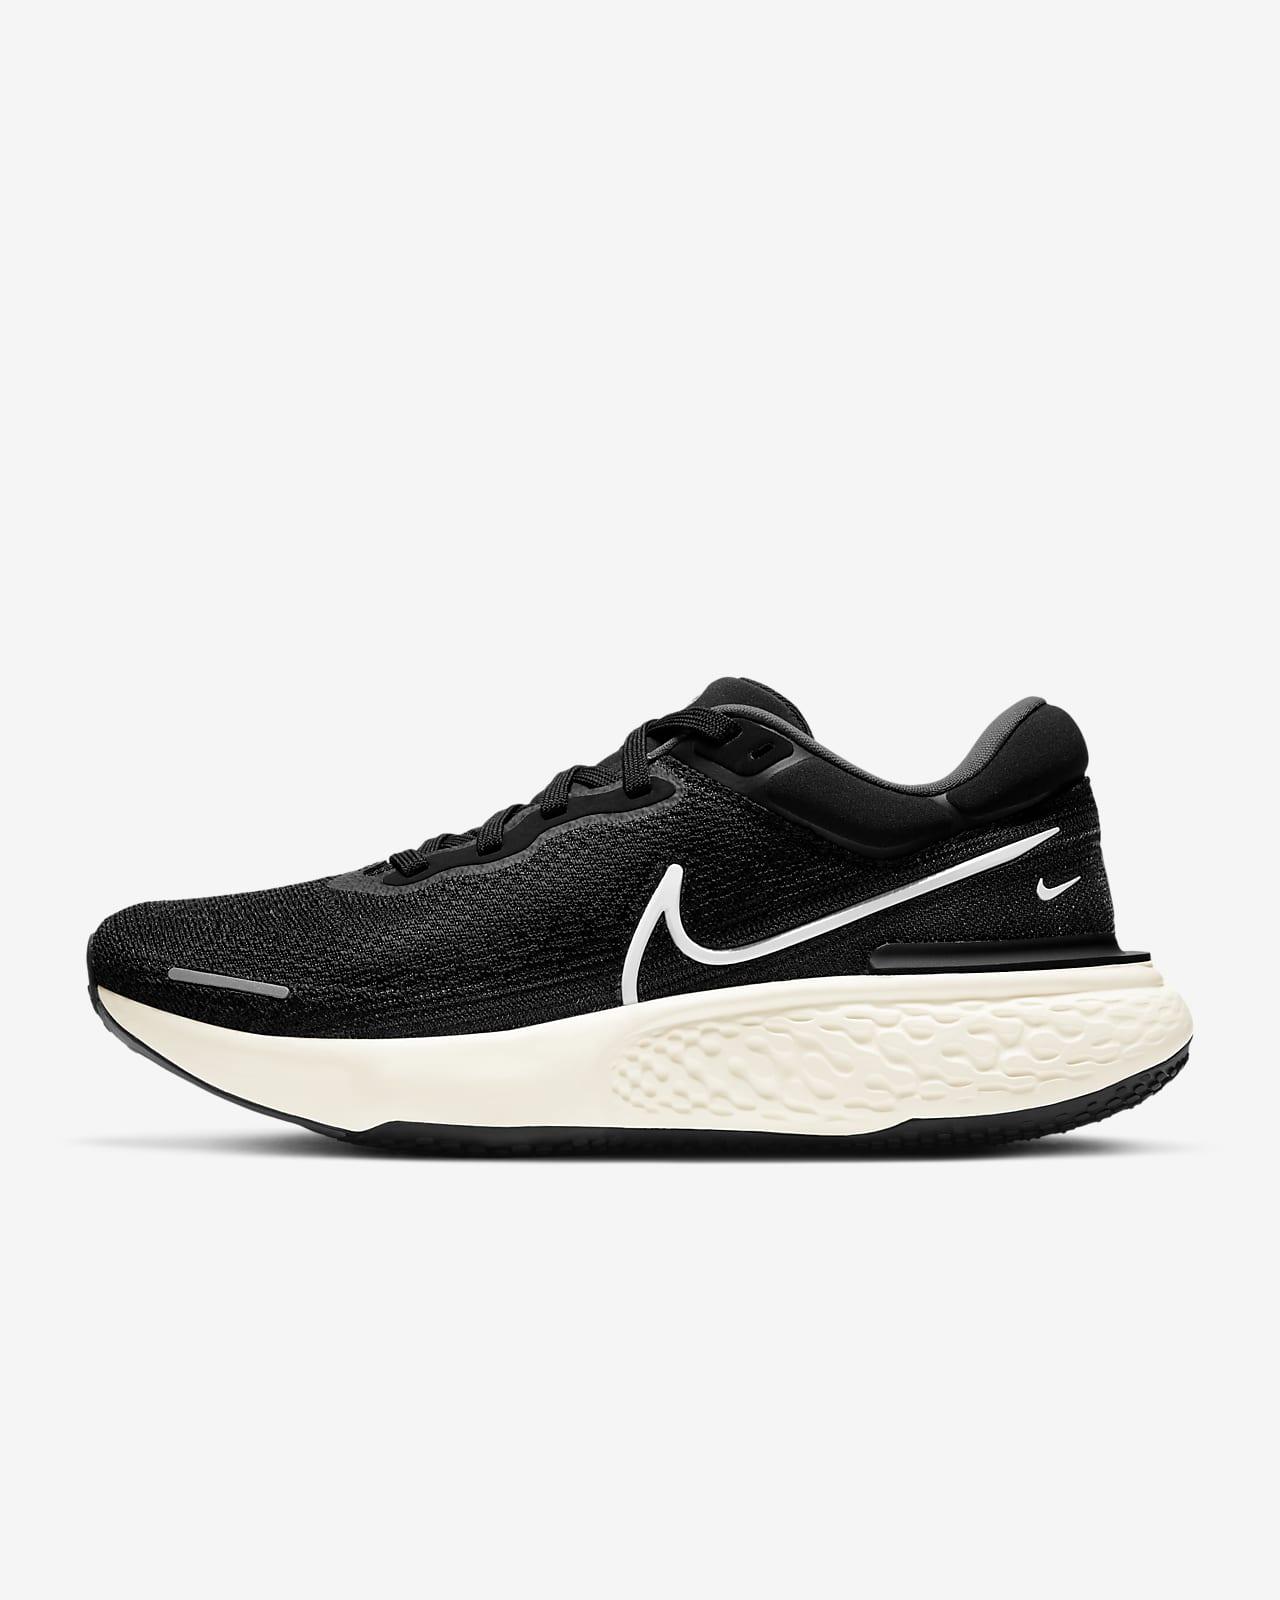 Nike ZoomX Invincible Run Flyknit Herren-Straßenlaufschuh